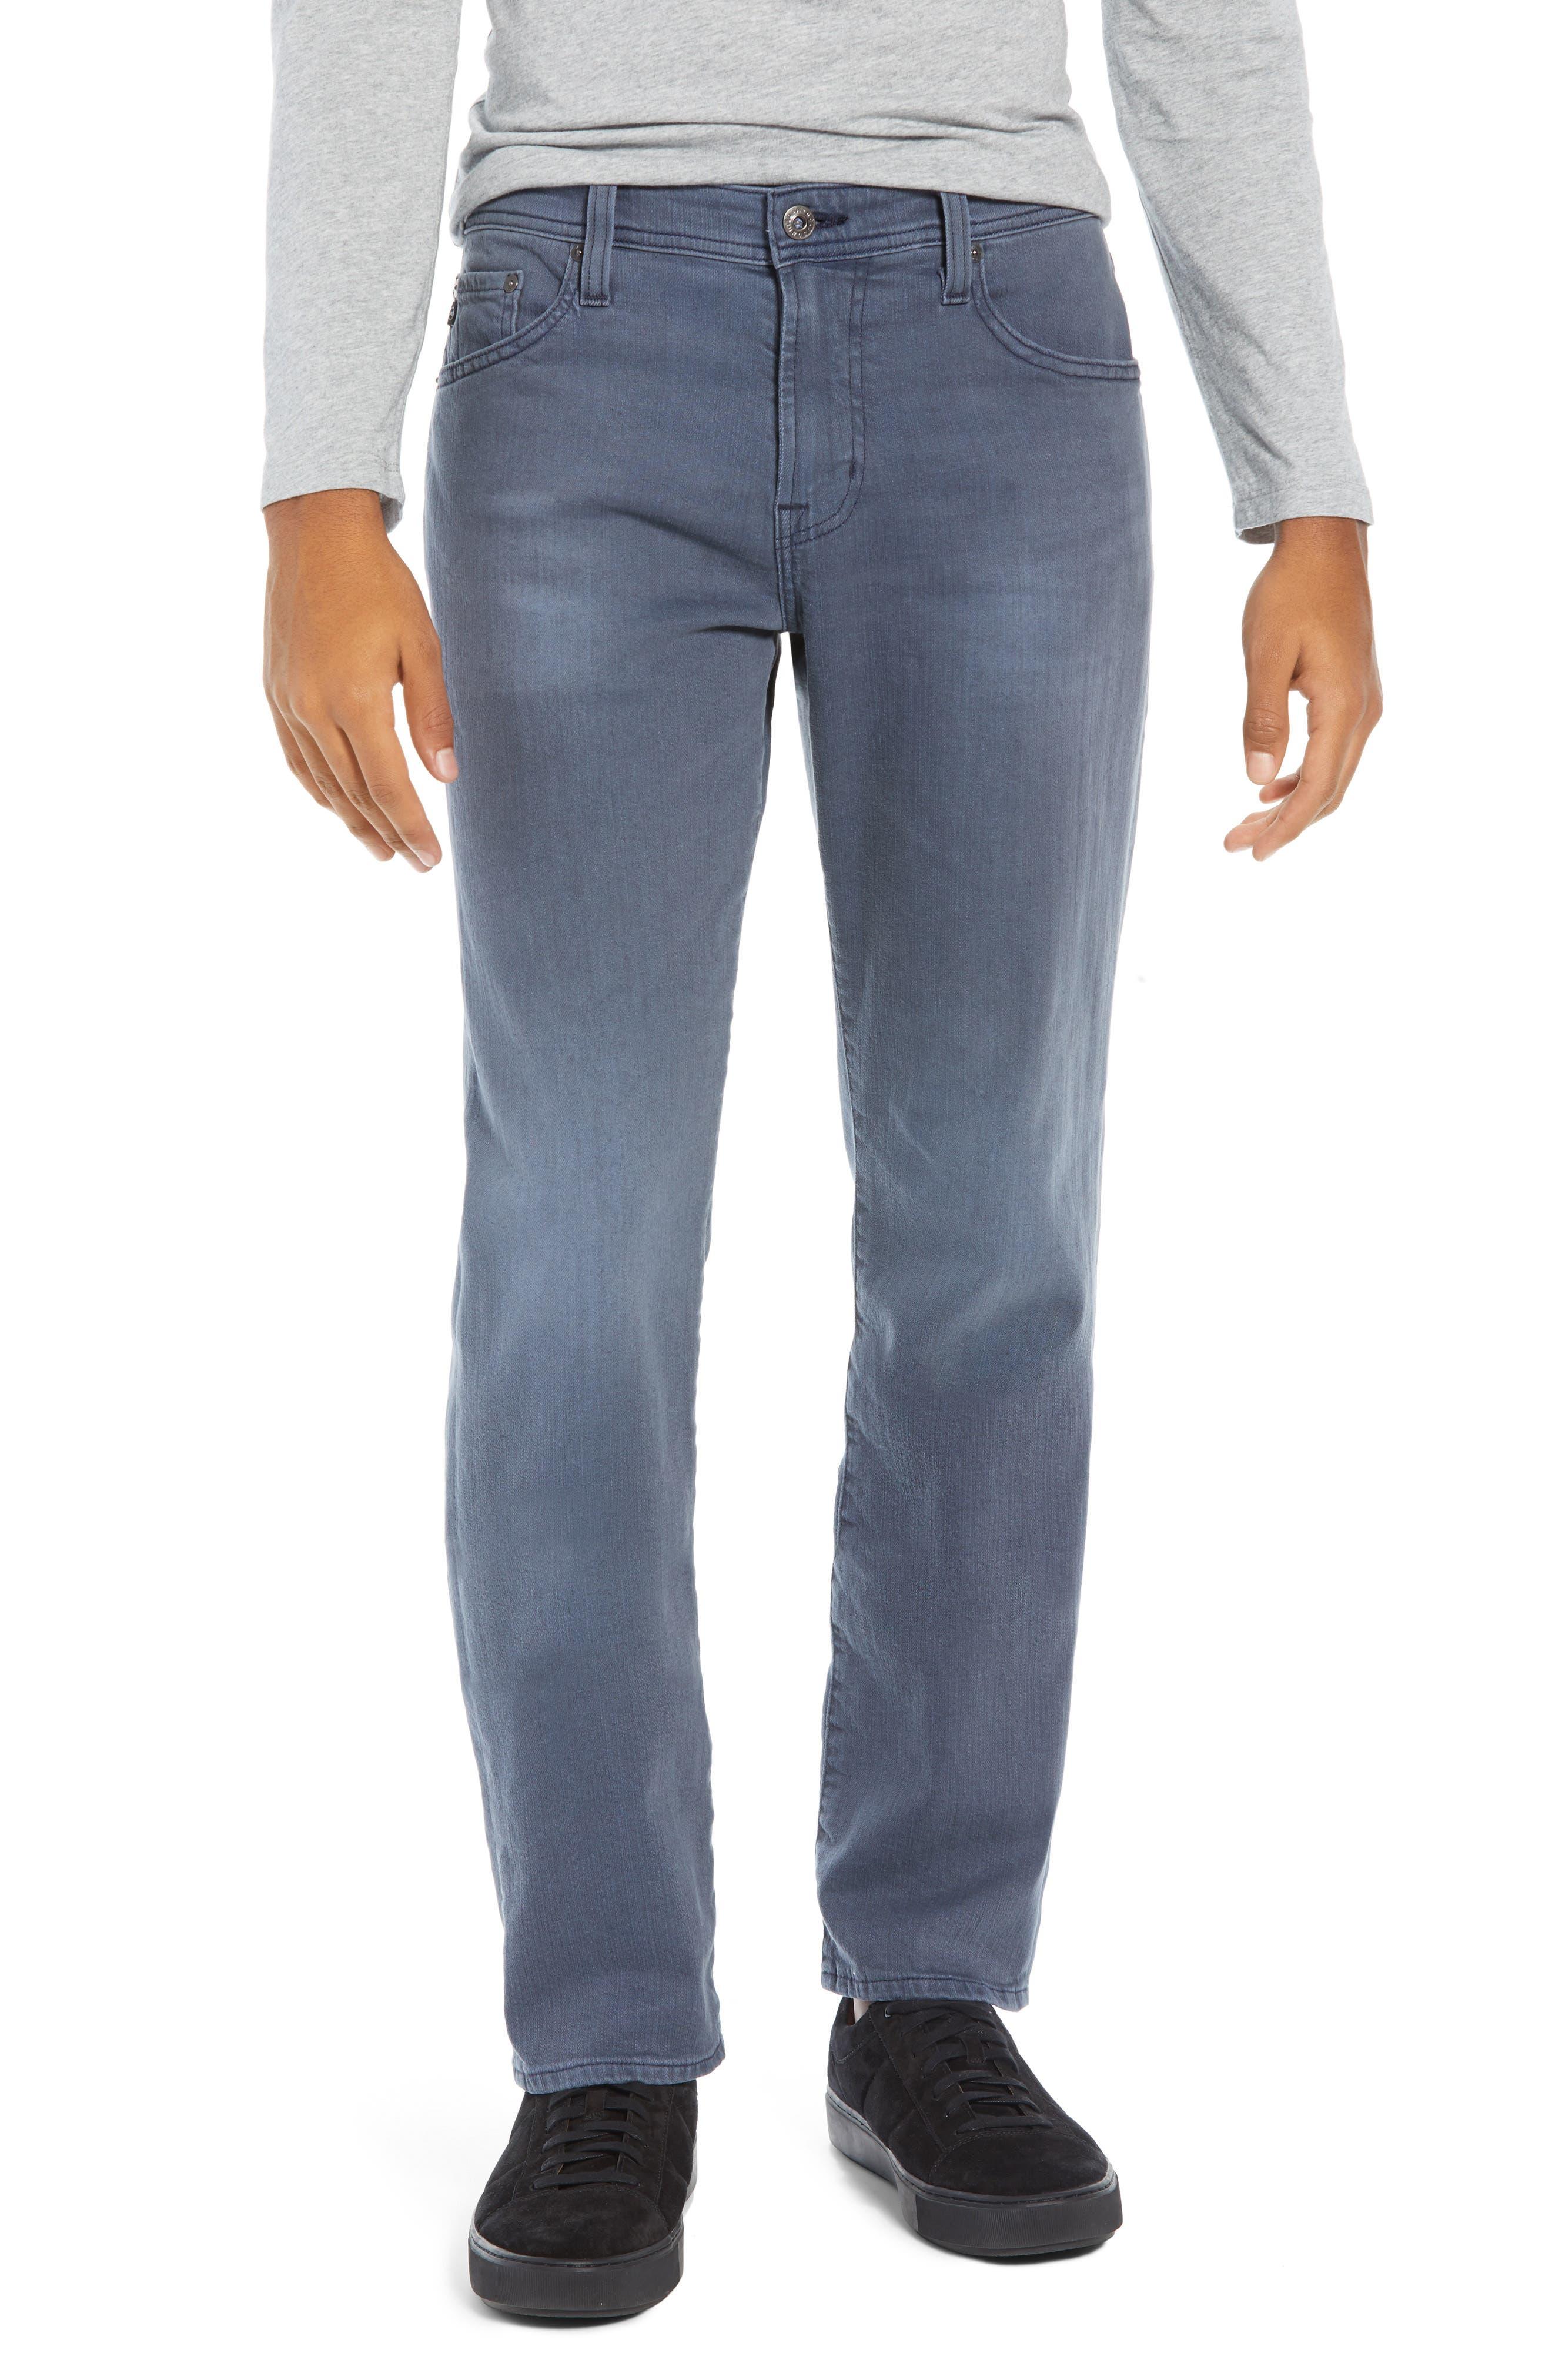 Graduate Slim Straight Leg Jeans,                             Main thumbnail 1, color,                             FLUXING TIDES